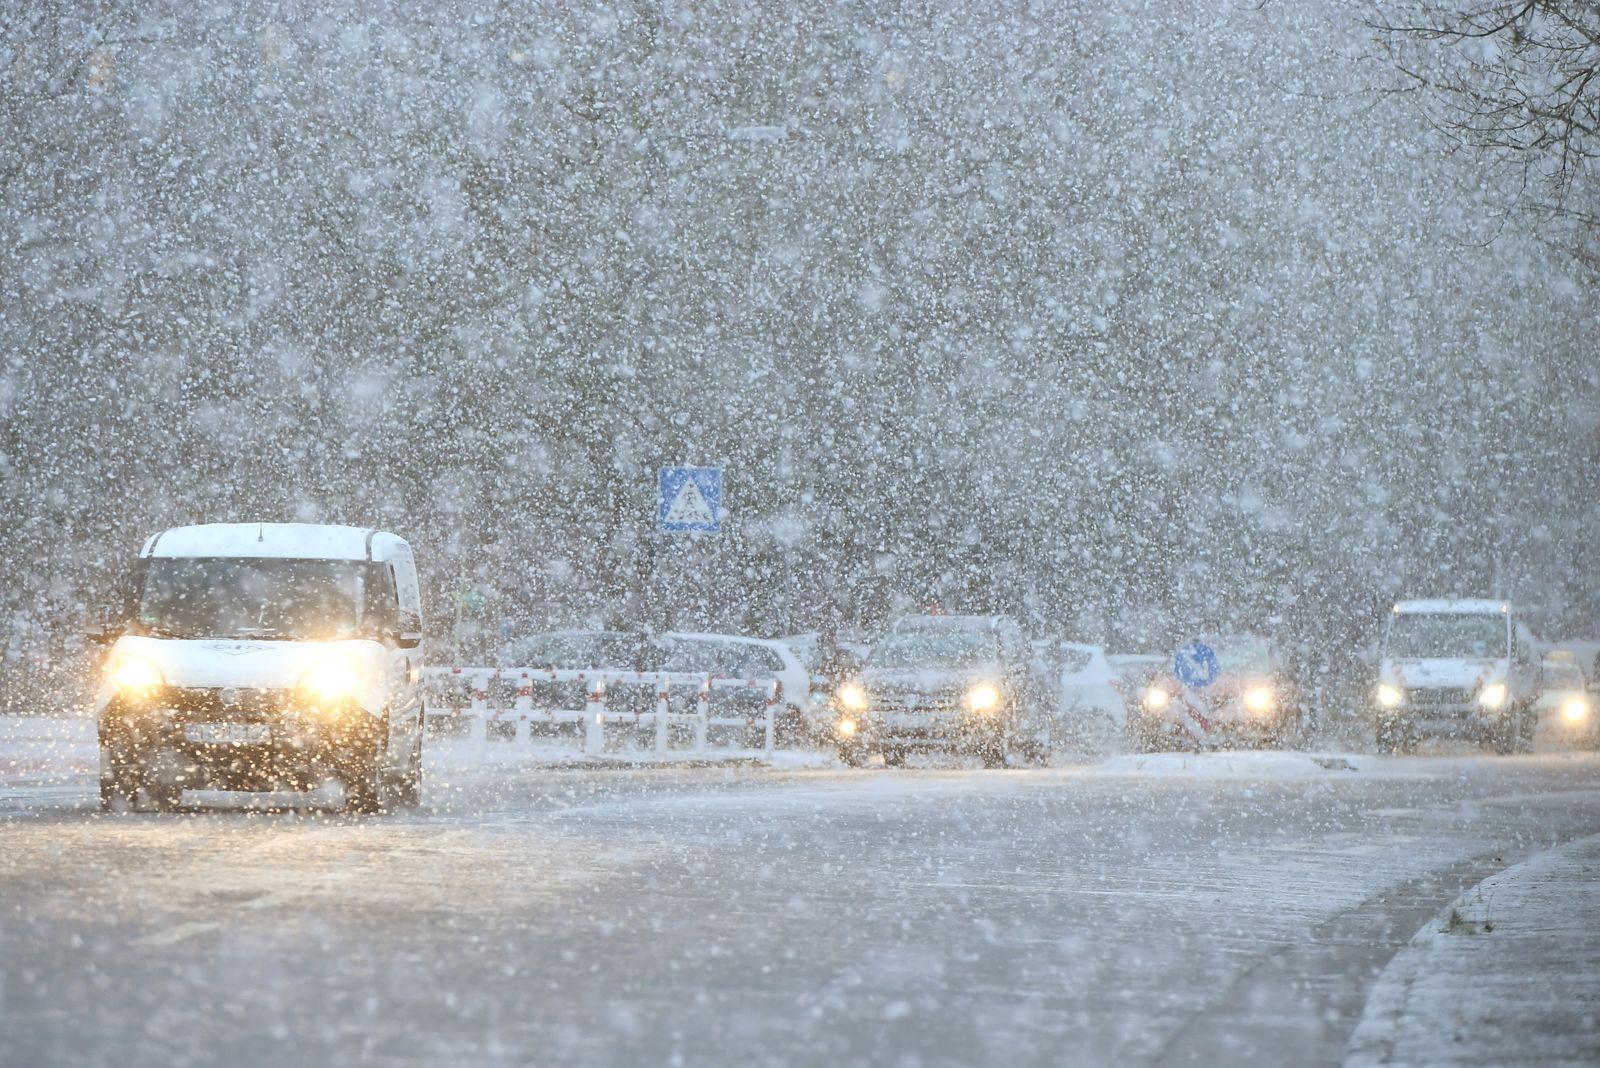 Winterwetter in Niedersachsen